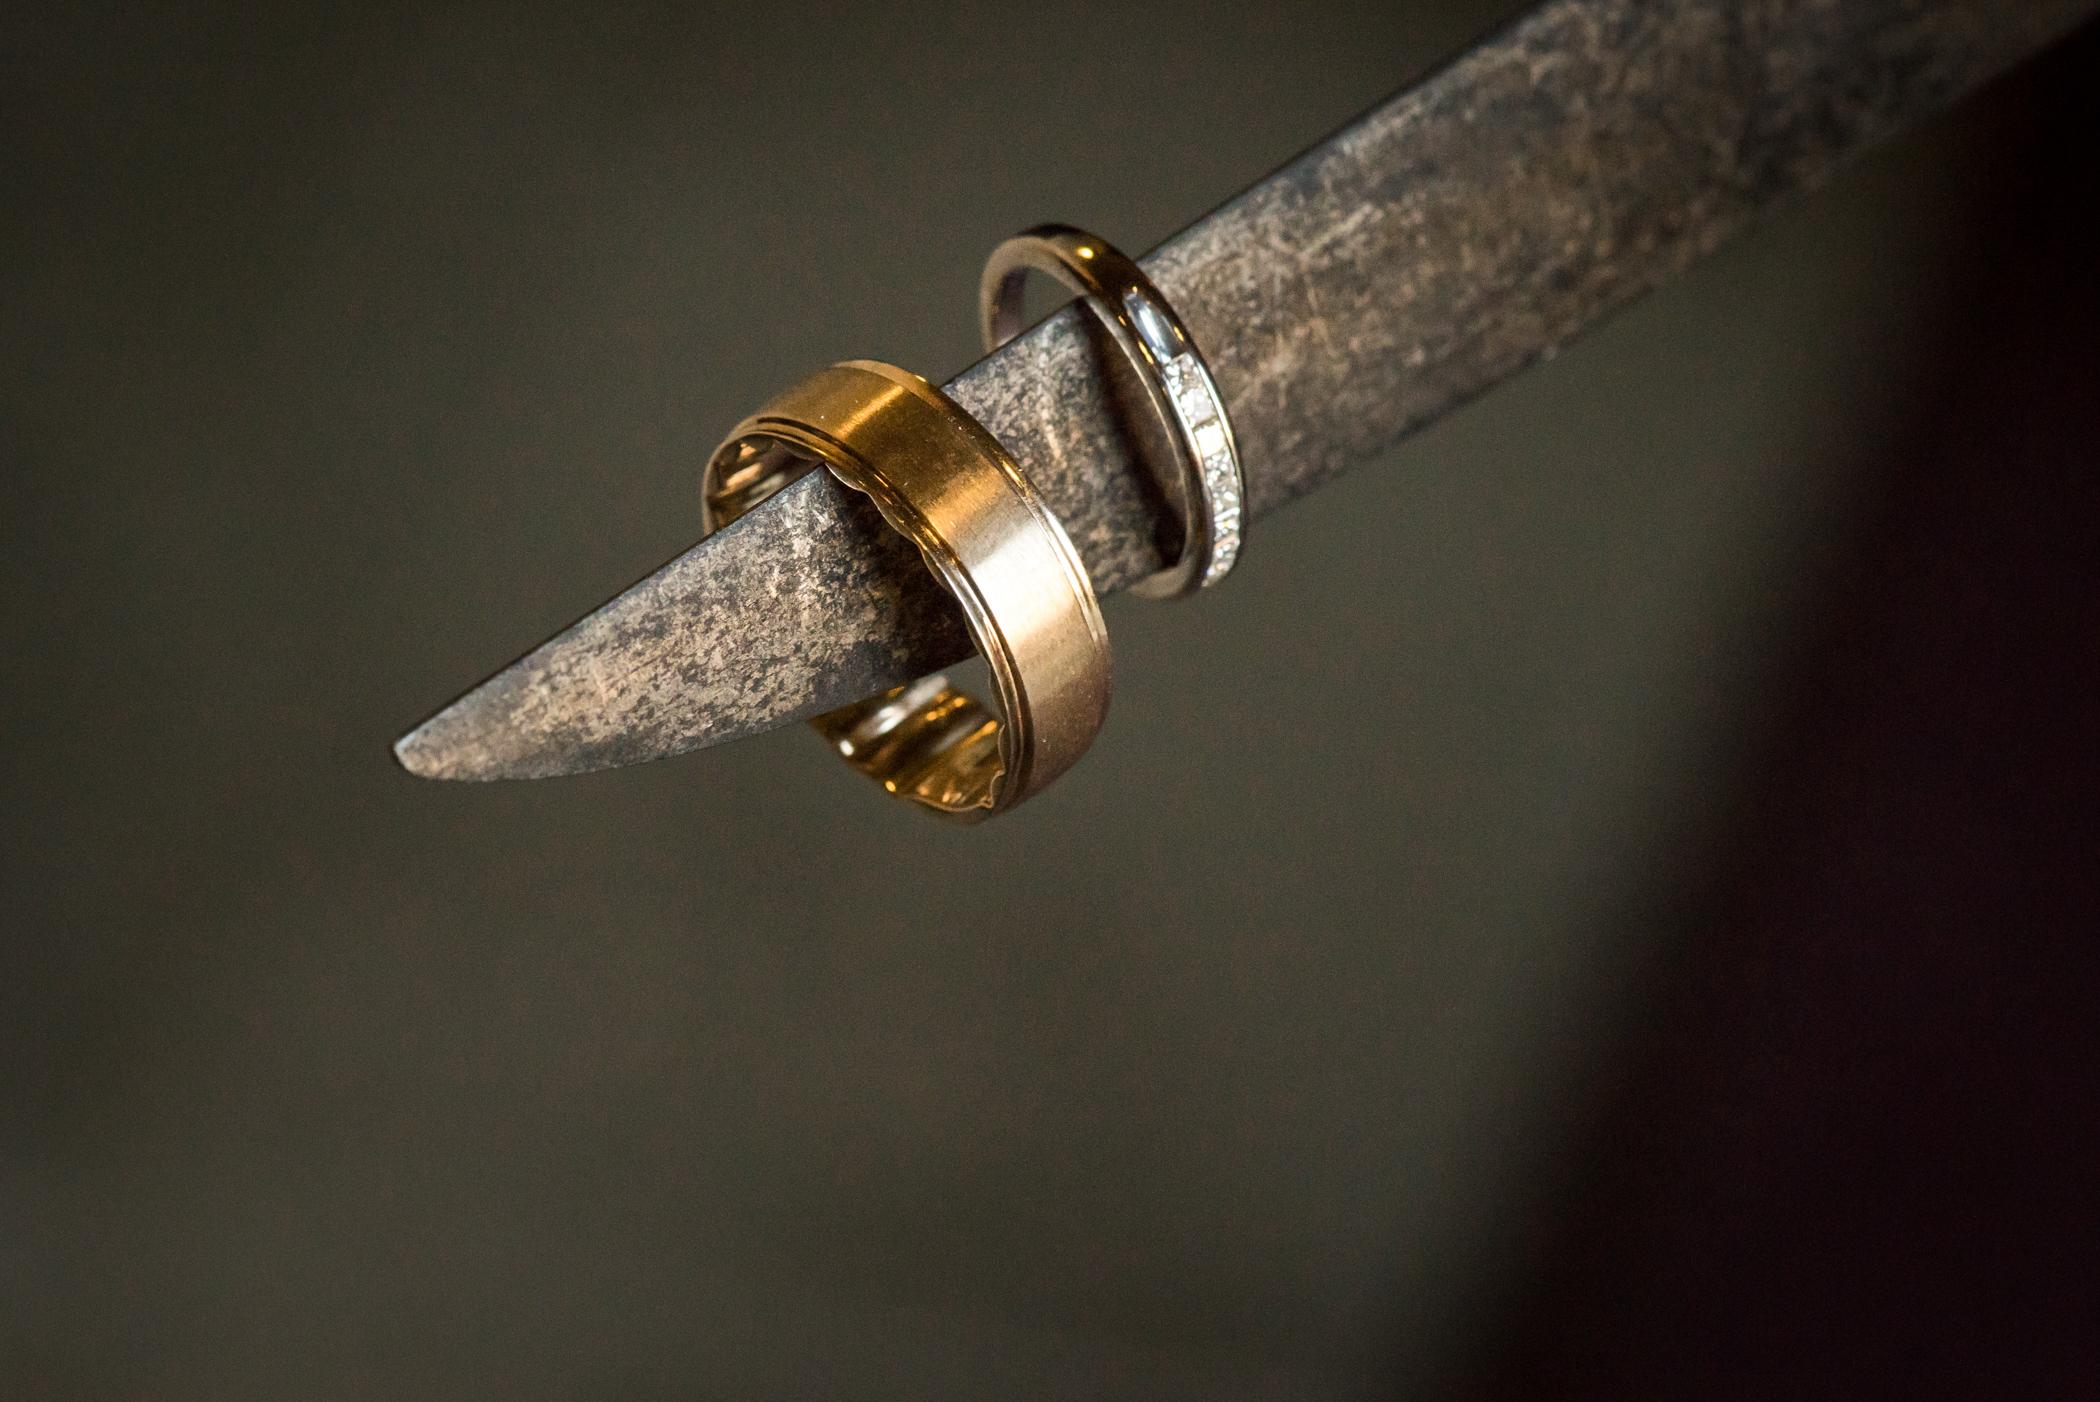 Stefy Hilmer Photography-wedding rings on the sword.jpg